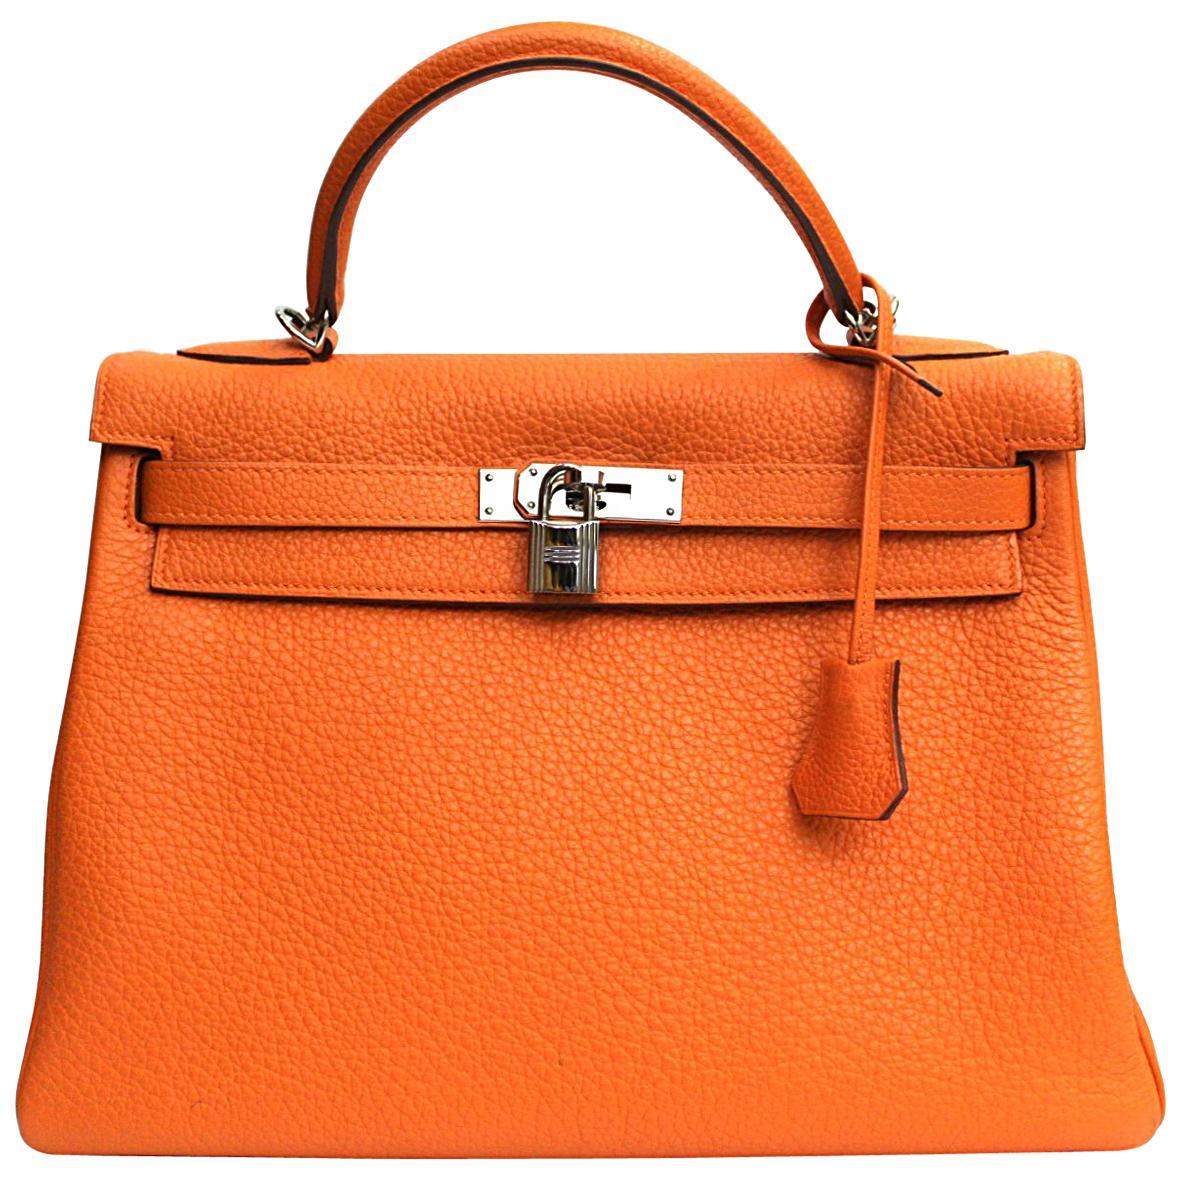 Hermes Orange Leather Kelly Taurillon Clemence 32cm Bag